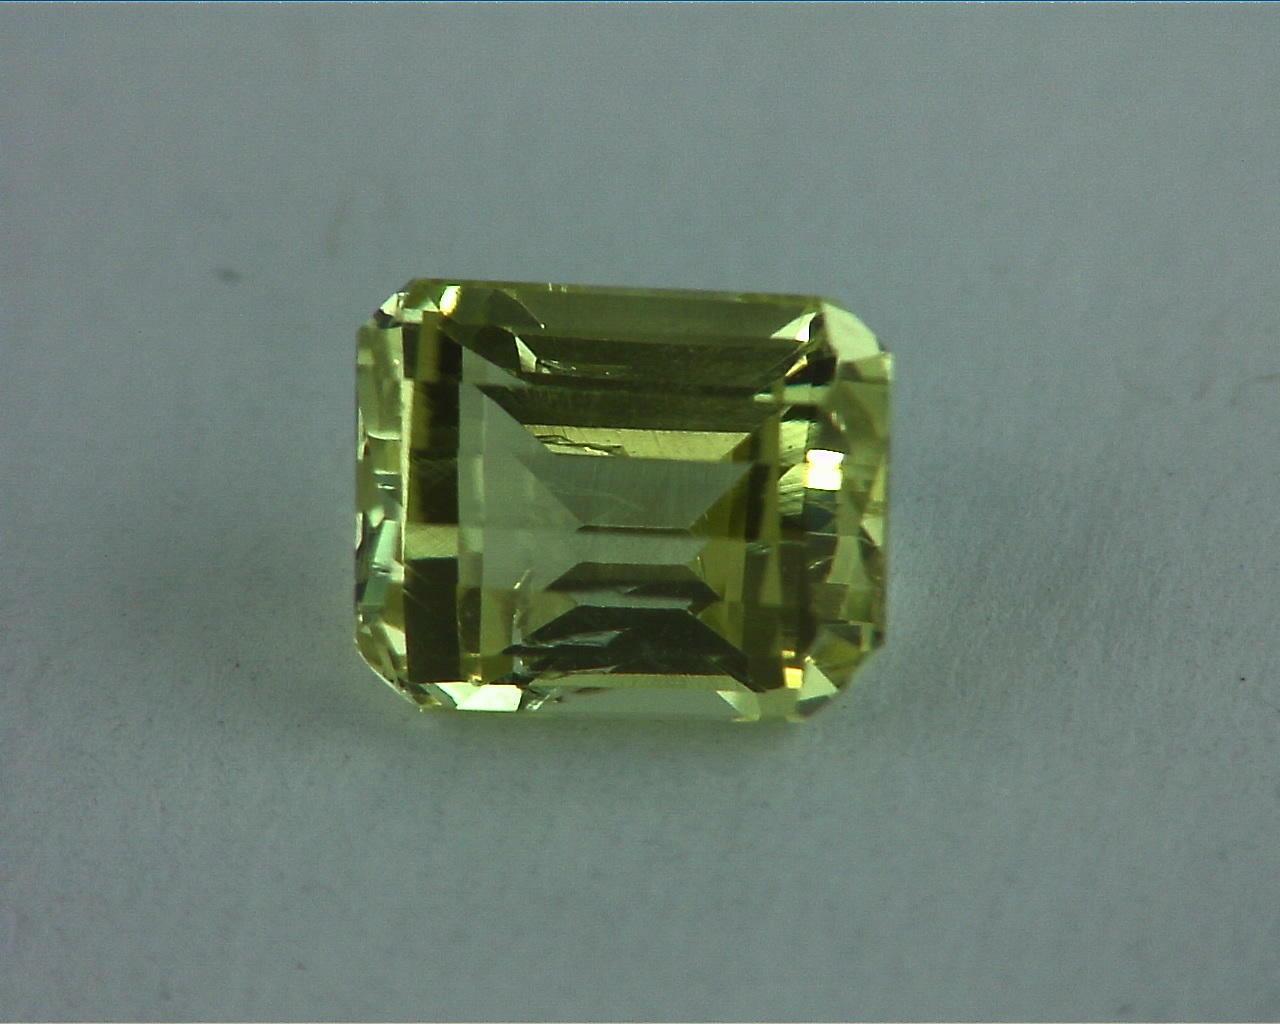 Sphine Faceted Natural Genuine Gemstone GRG726